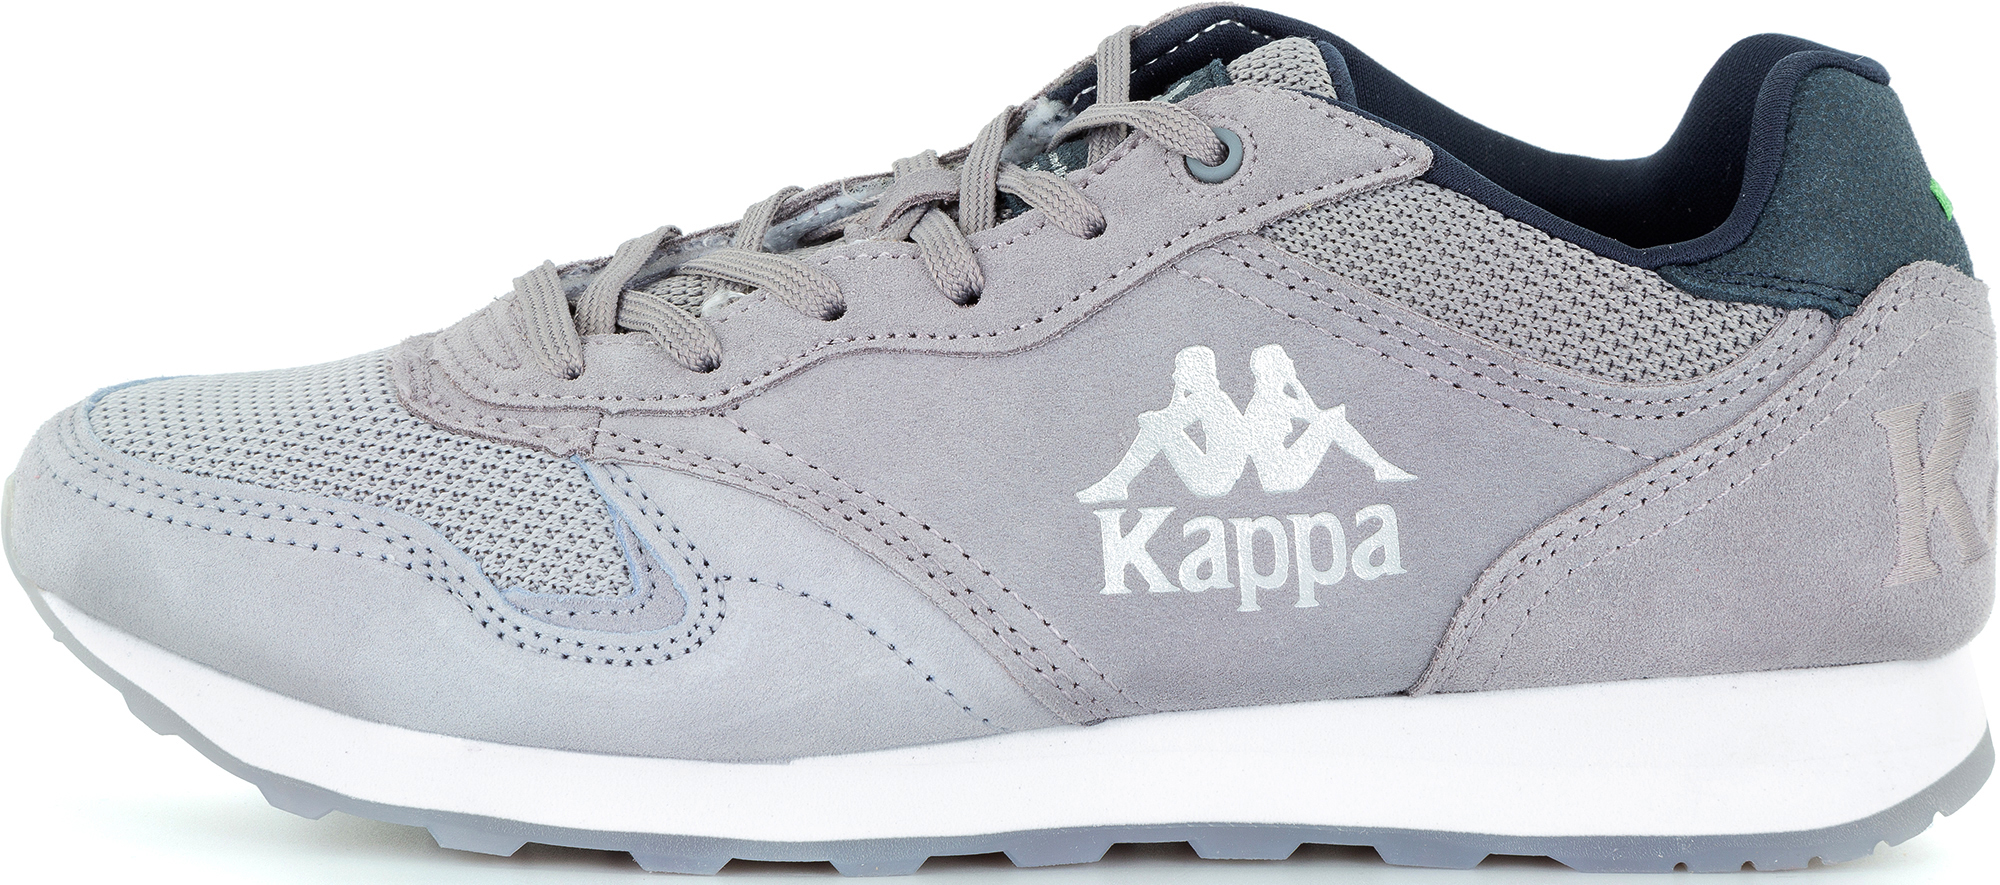 Kappa Кроссовки женские Kappa Authentic Run, размер 40